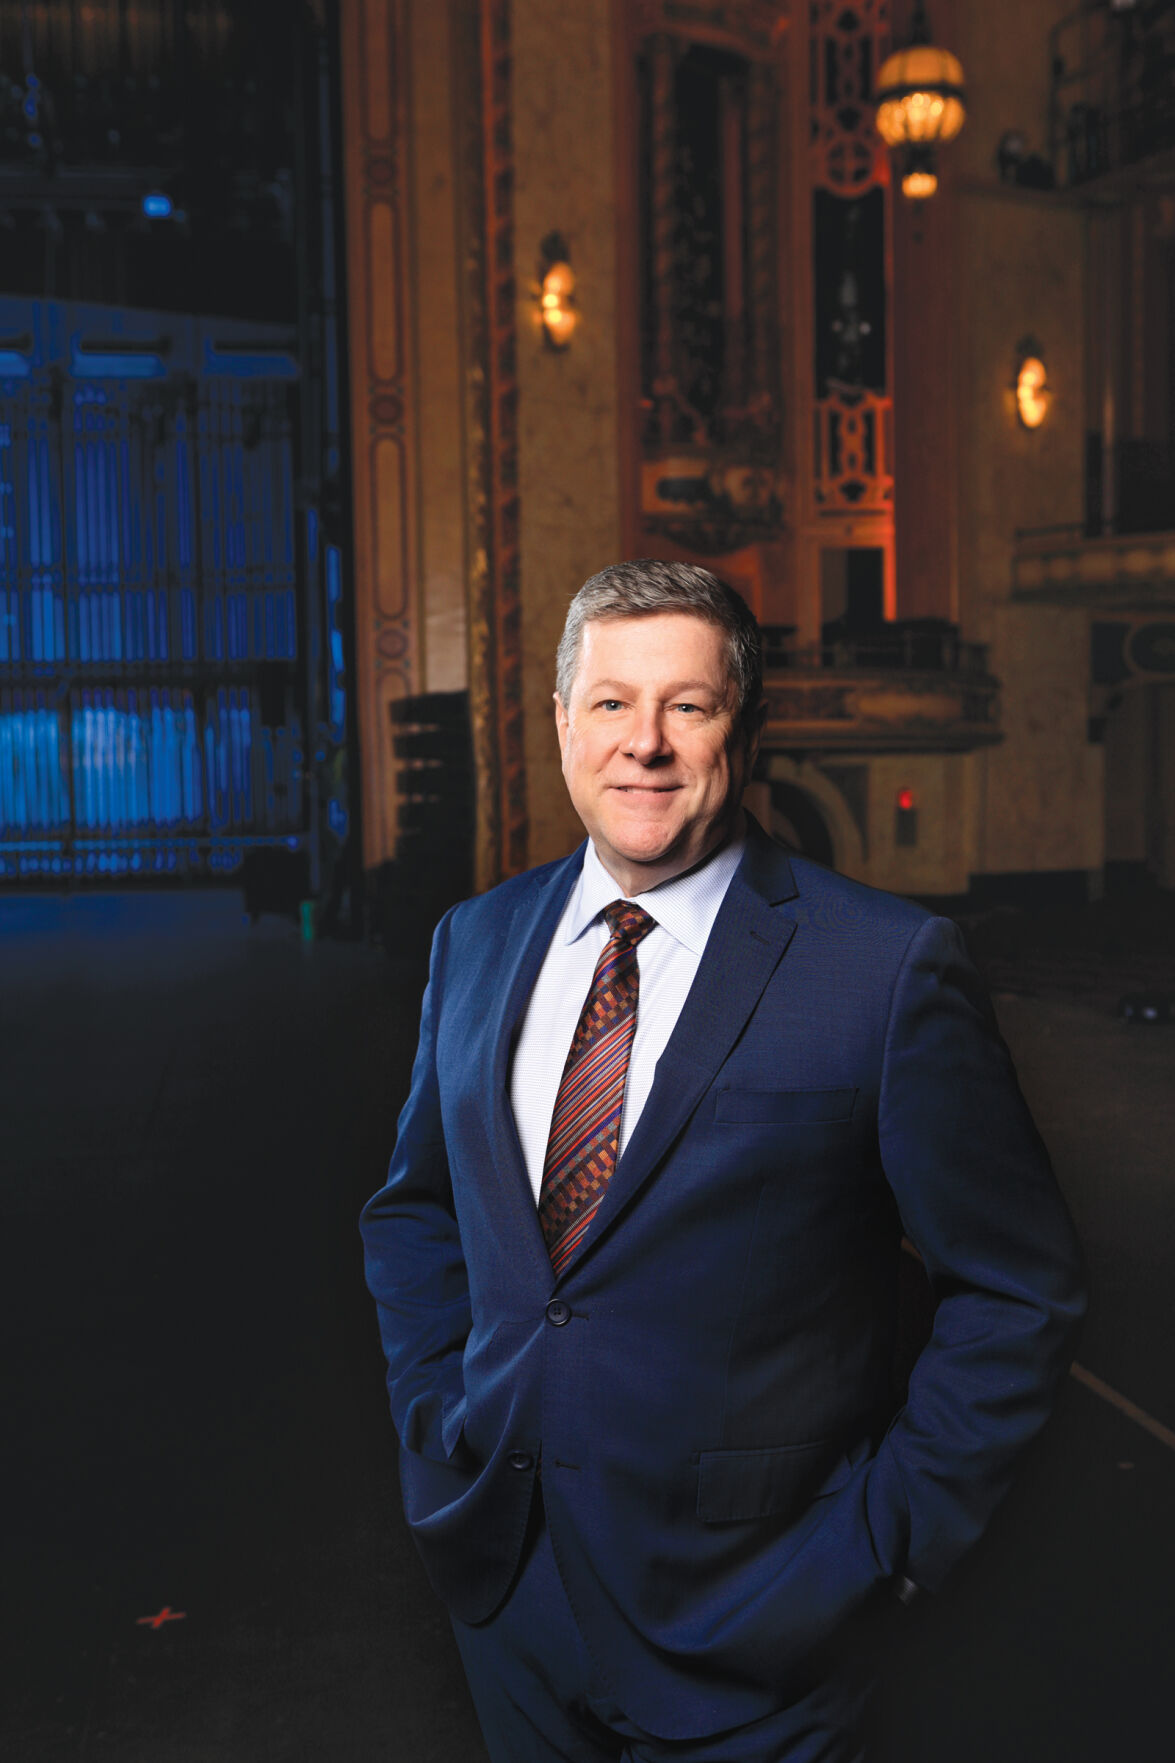 Shea's President Michael Murphy